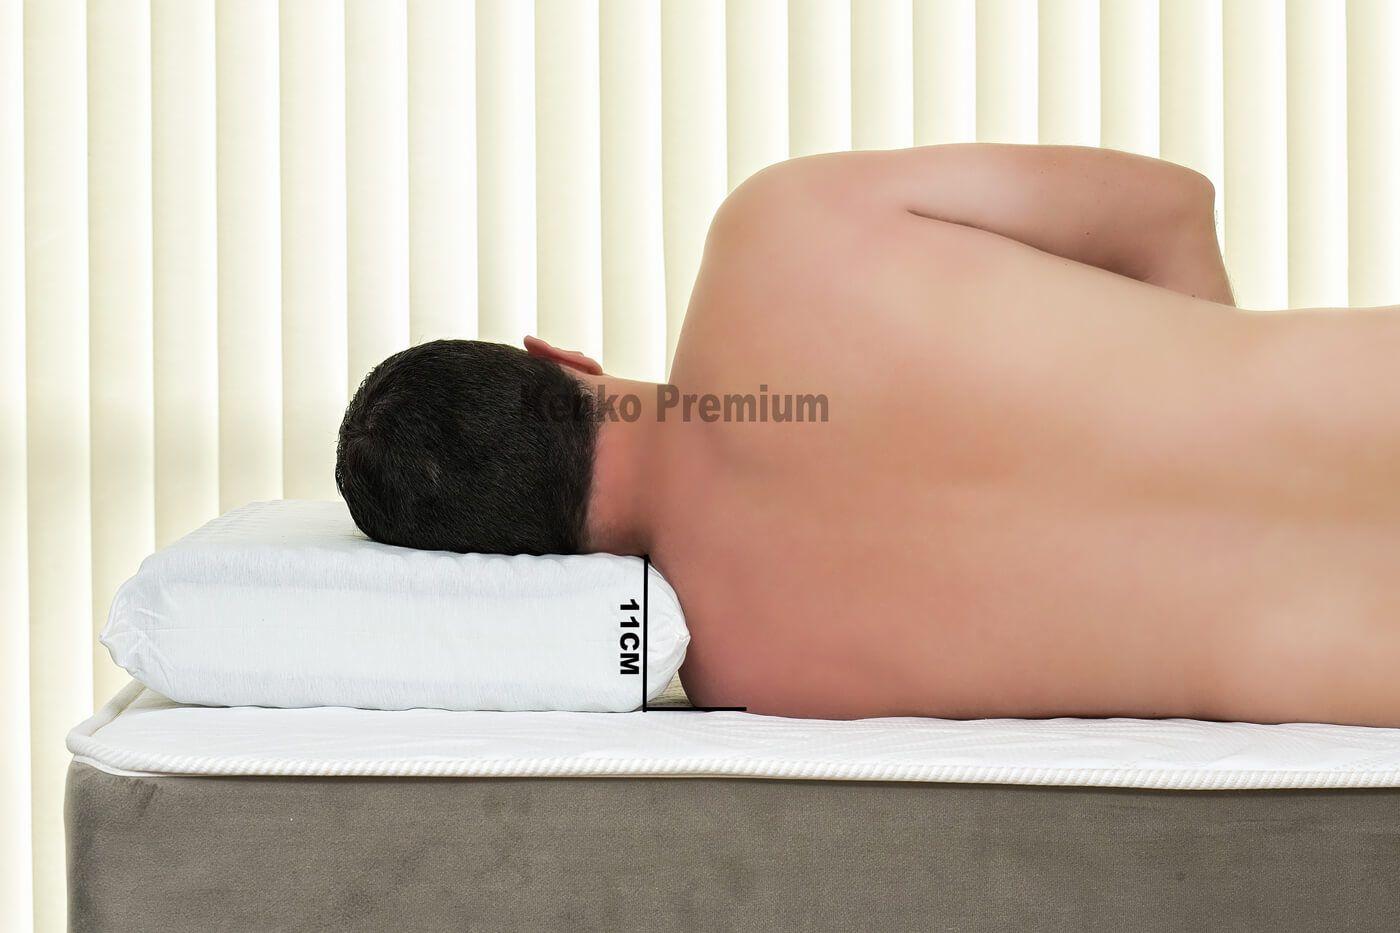 Travesseiro Magnético Kenko Premium Látex HR Opções de Altura  - Kenko Premium Colchões